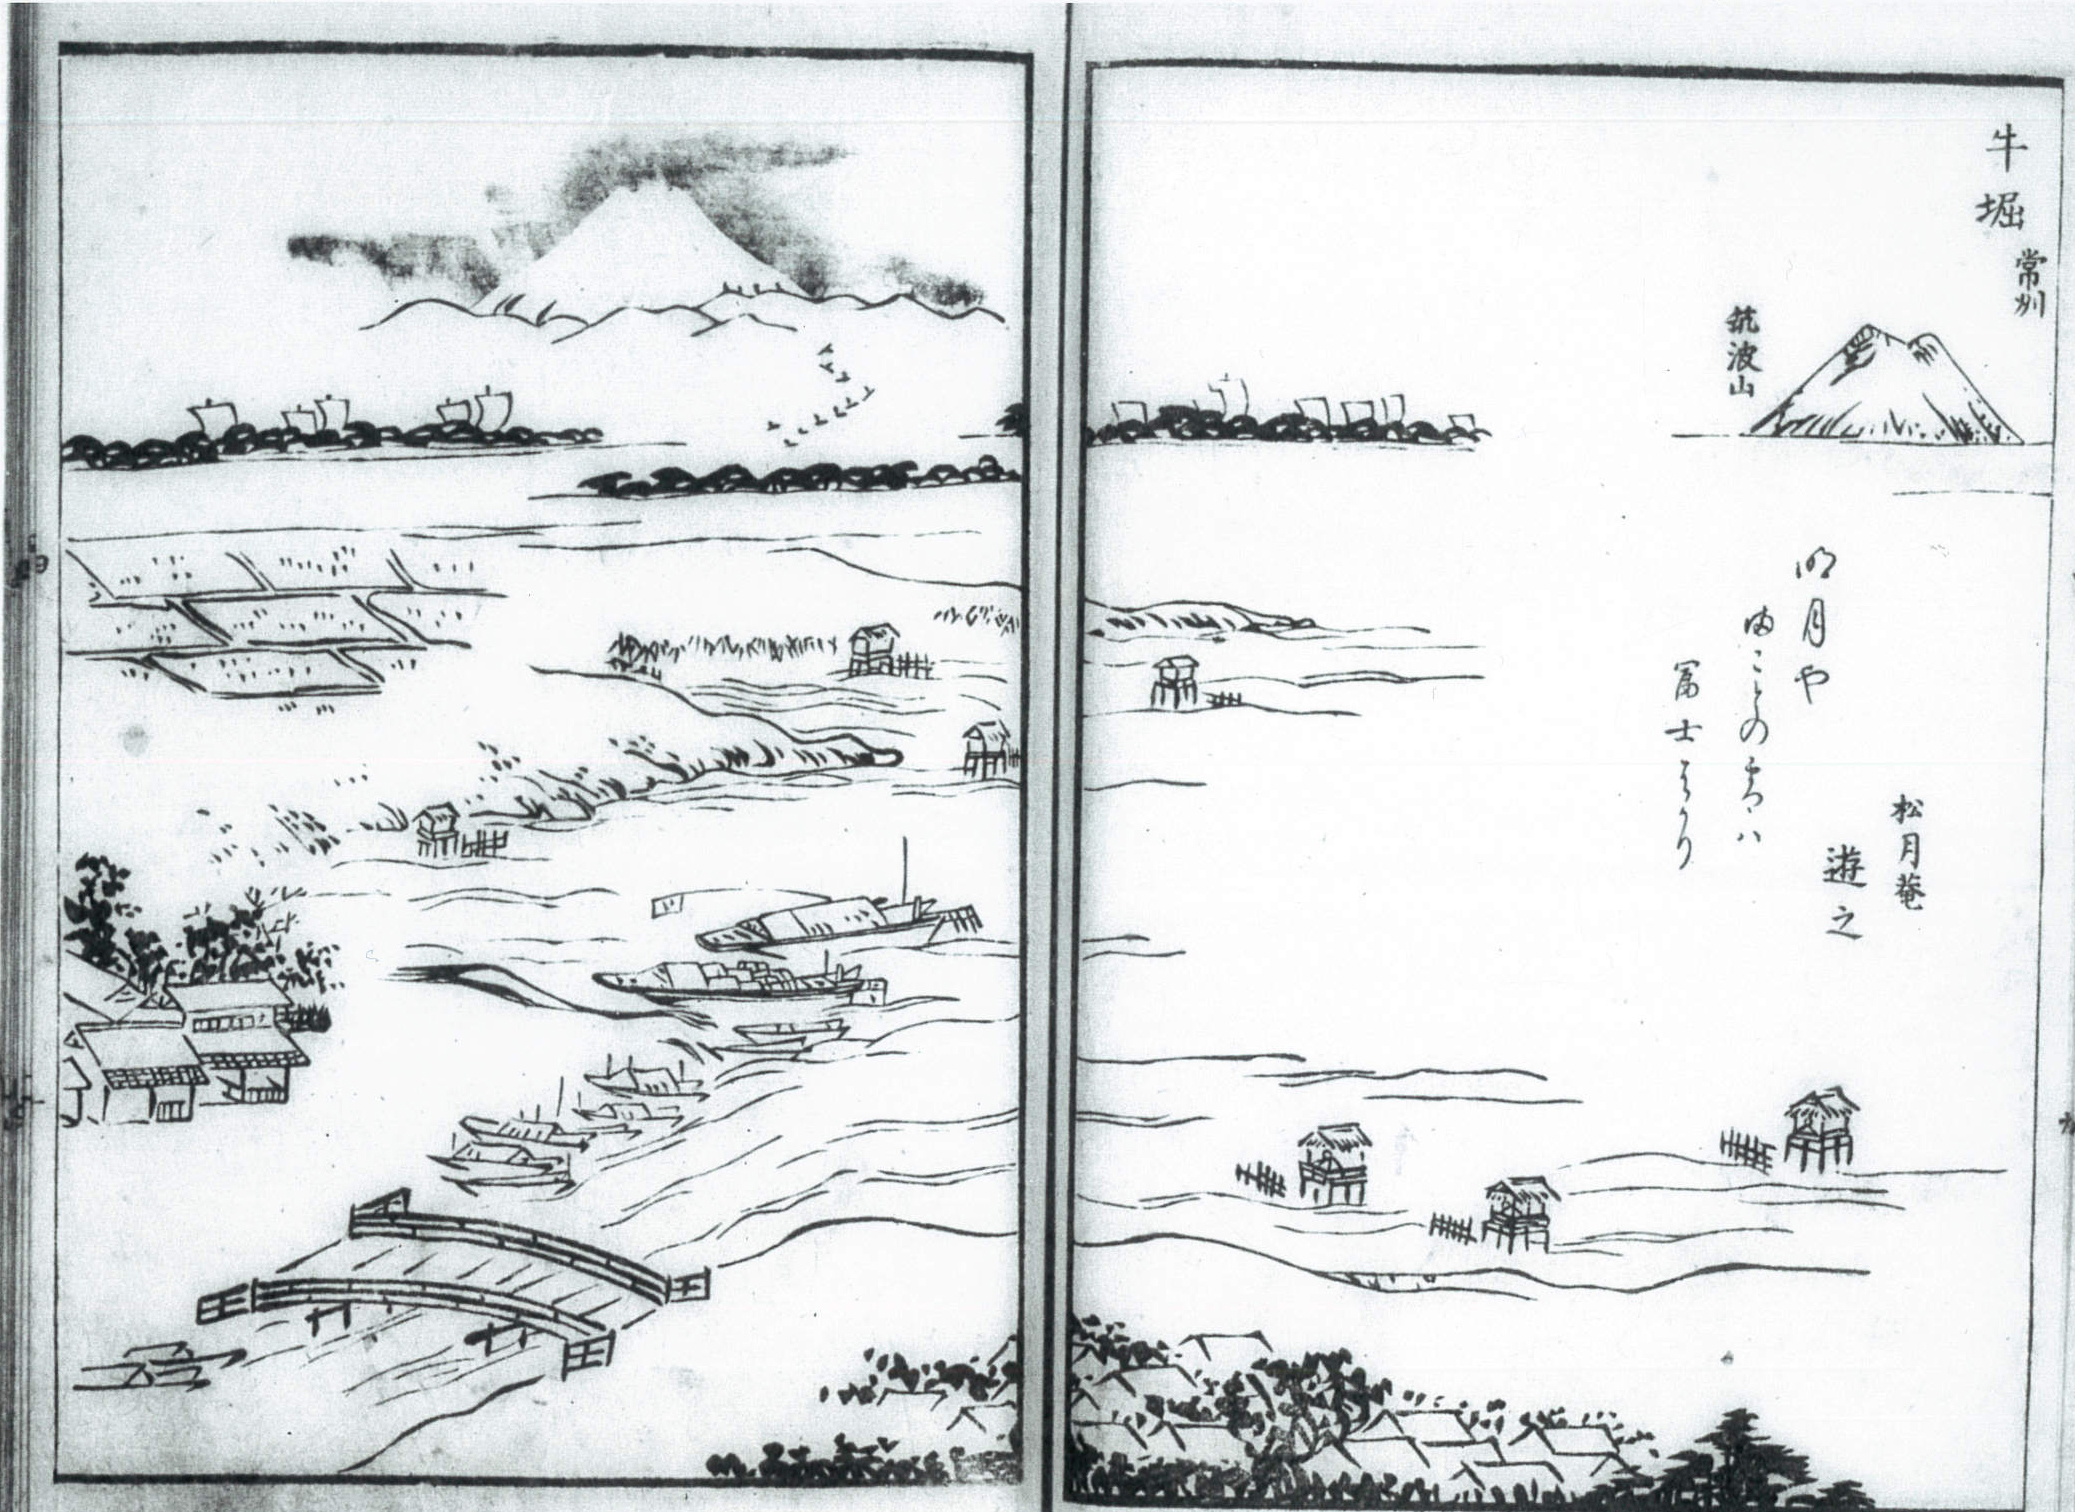 https://upload.wikimedia.org/wikipedia/commons/e/e9/TrimMinsetsu_Ushibori.jpg